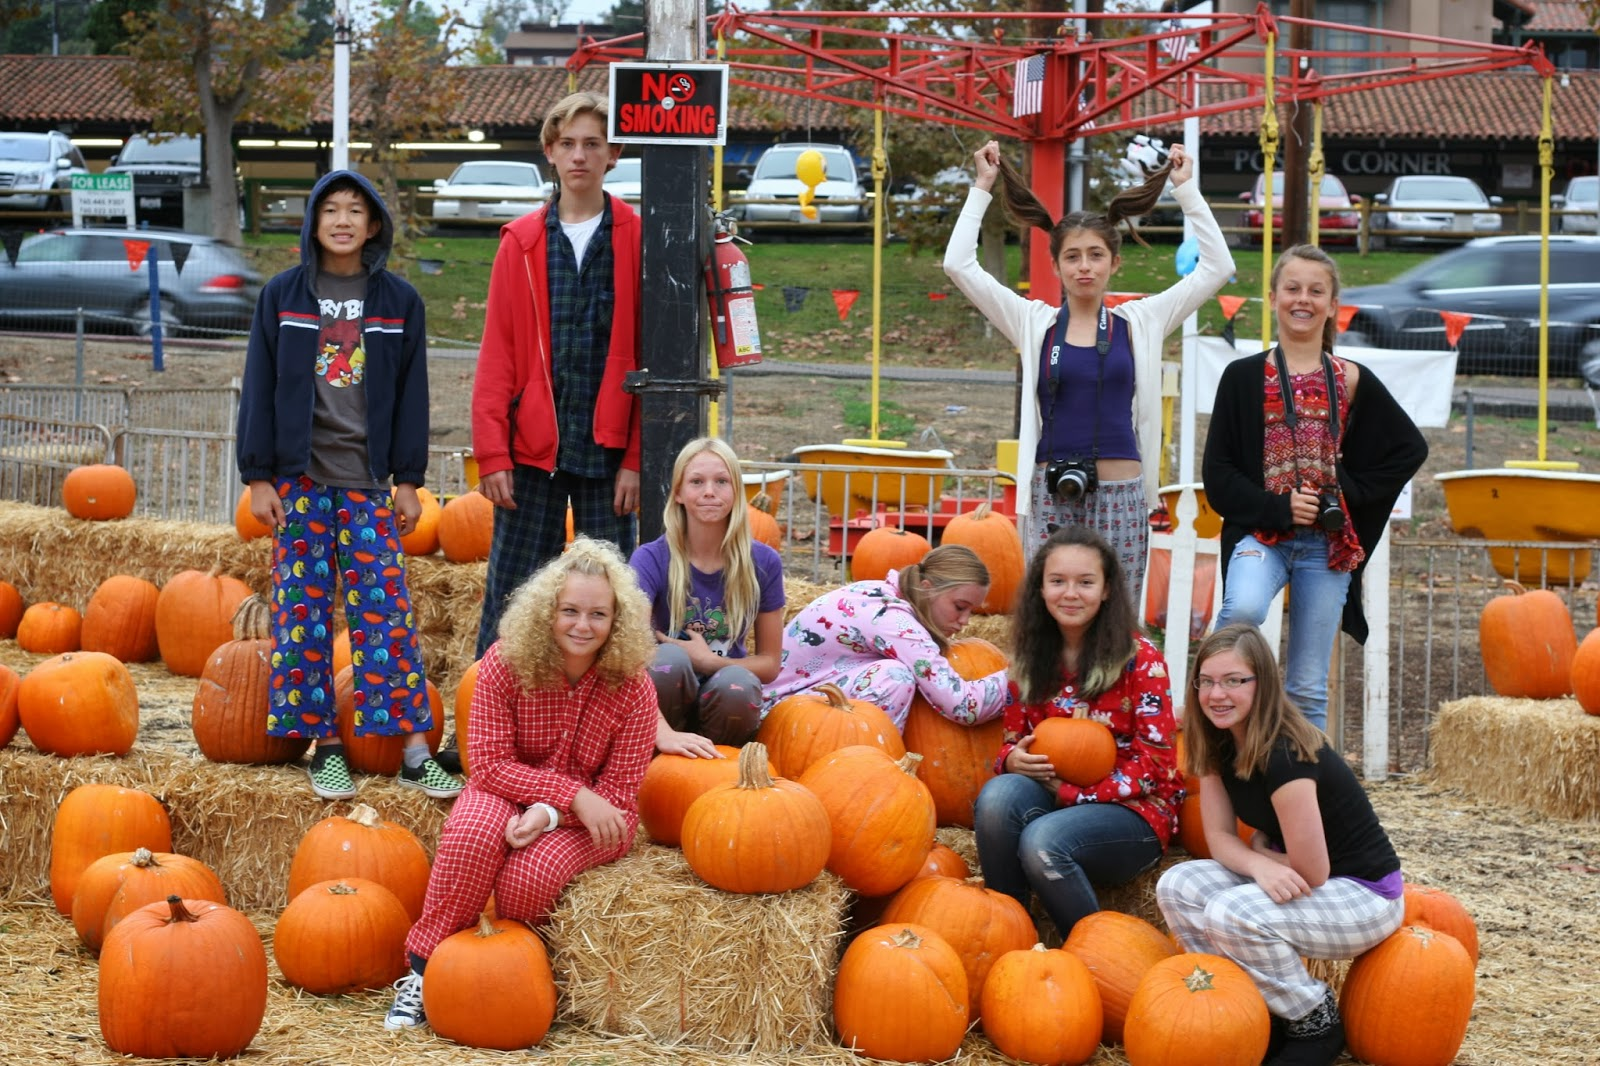 Grauer Art Pumpkin Patch Field Trip Pajama And Crazy Hair Day 8th Grade Art